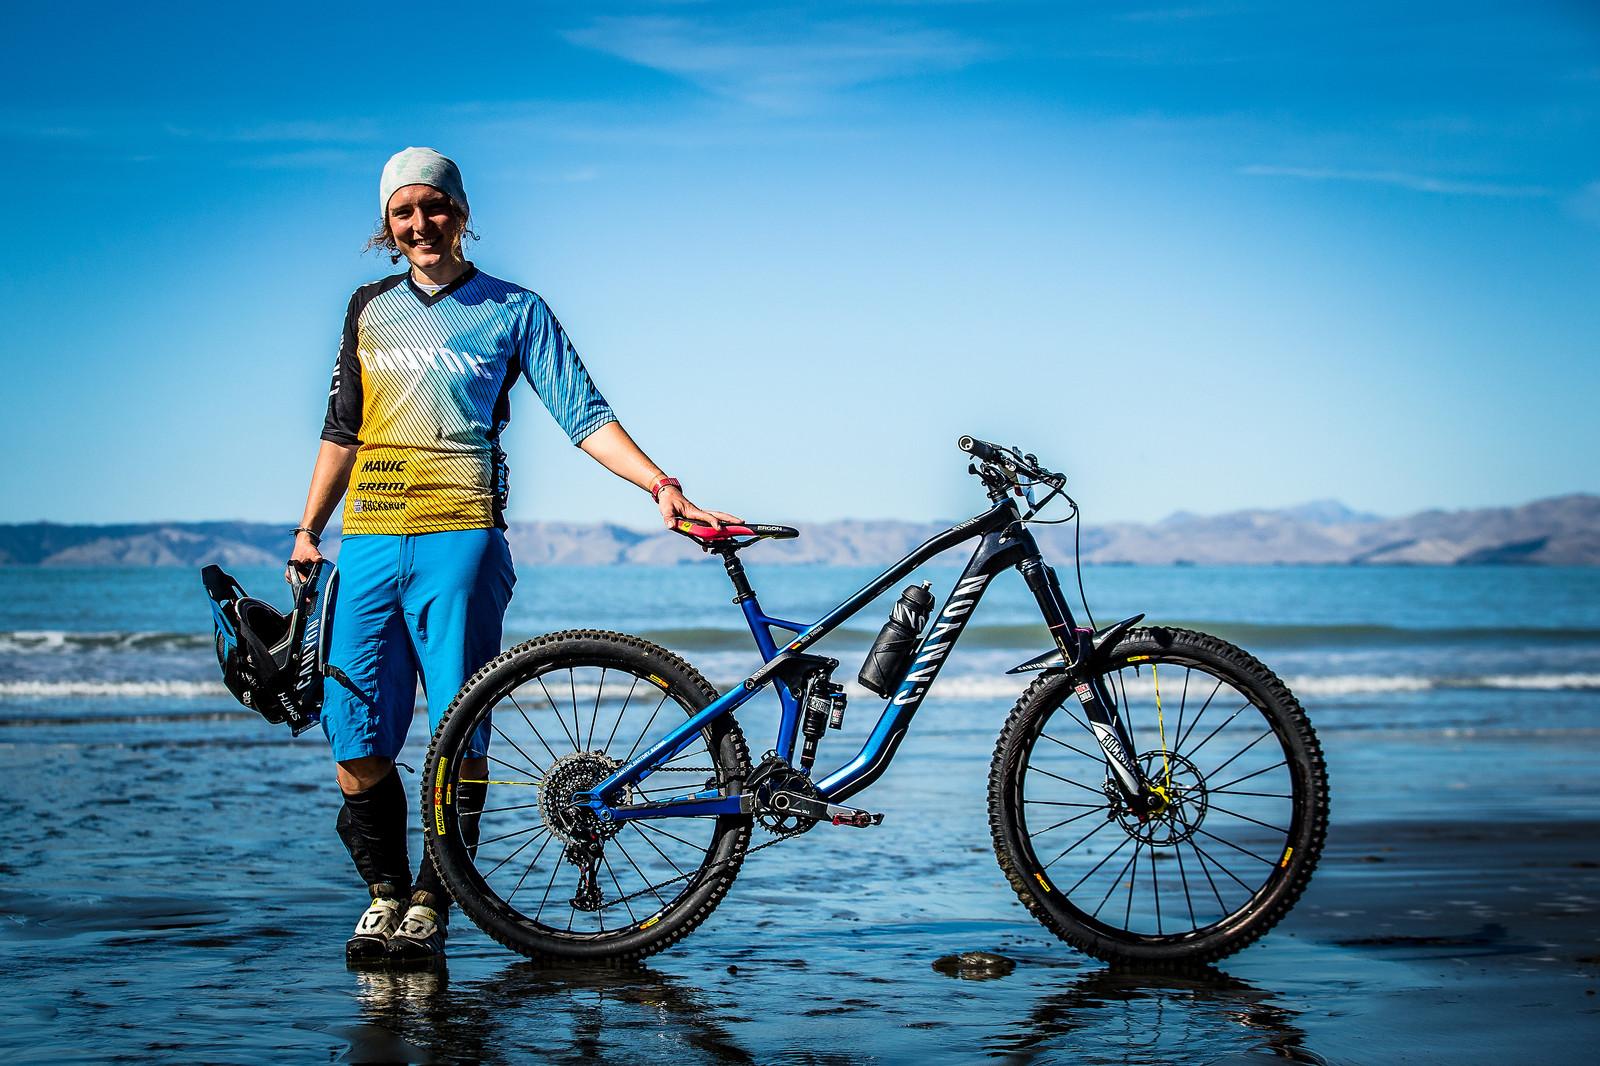 2017 NZ Enduro Pro Bikes - Ines Thoma's Canyon Strive - 2017 NZ Enduro Pro Bikes - They Wreck 'Em, We Check 'Em - Mountain Biking Pictures - Vital MTB